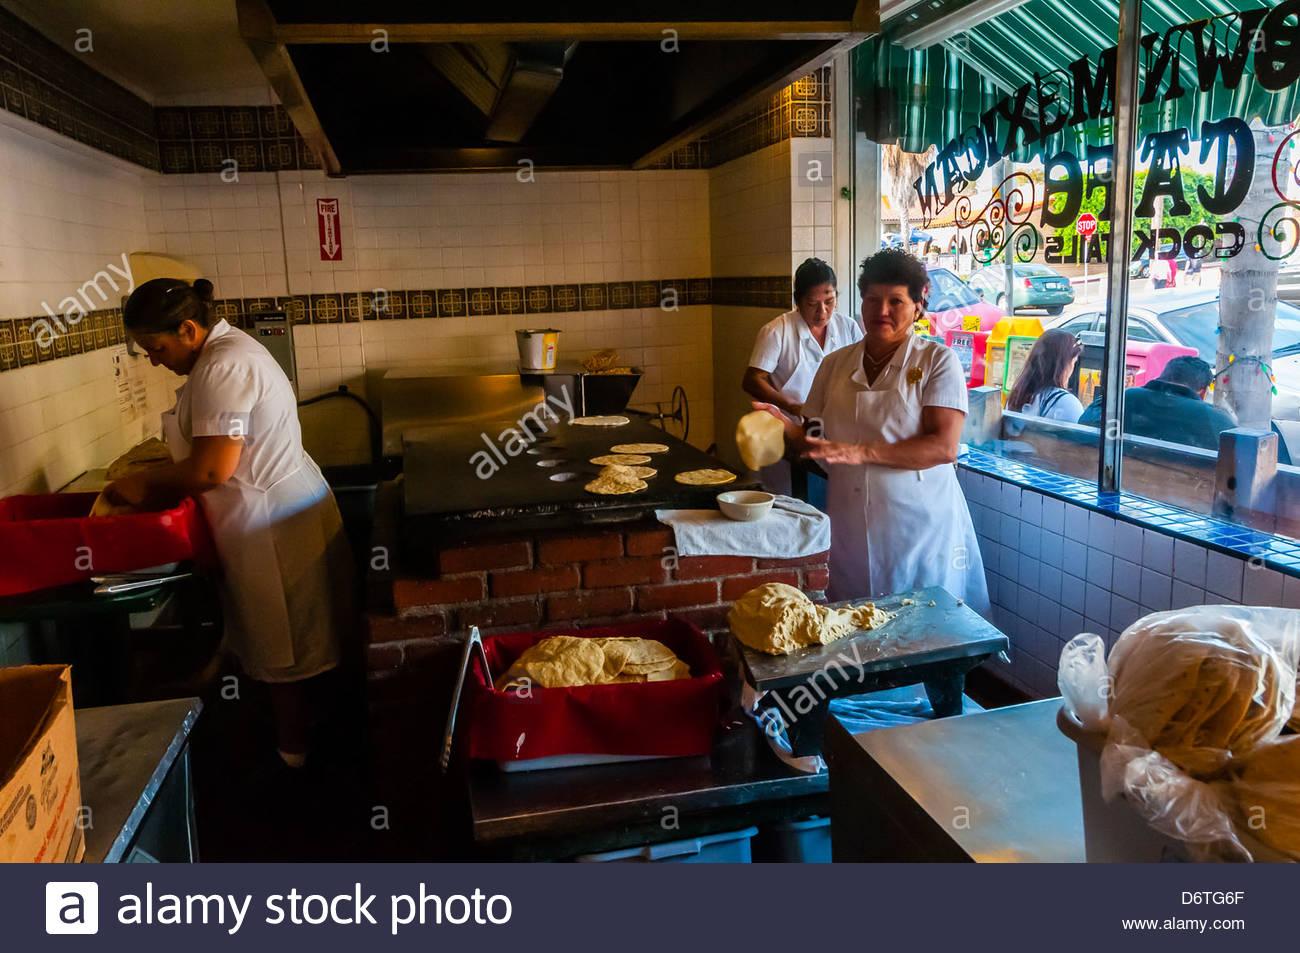 C Bakery Cafe San Diego